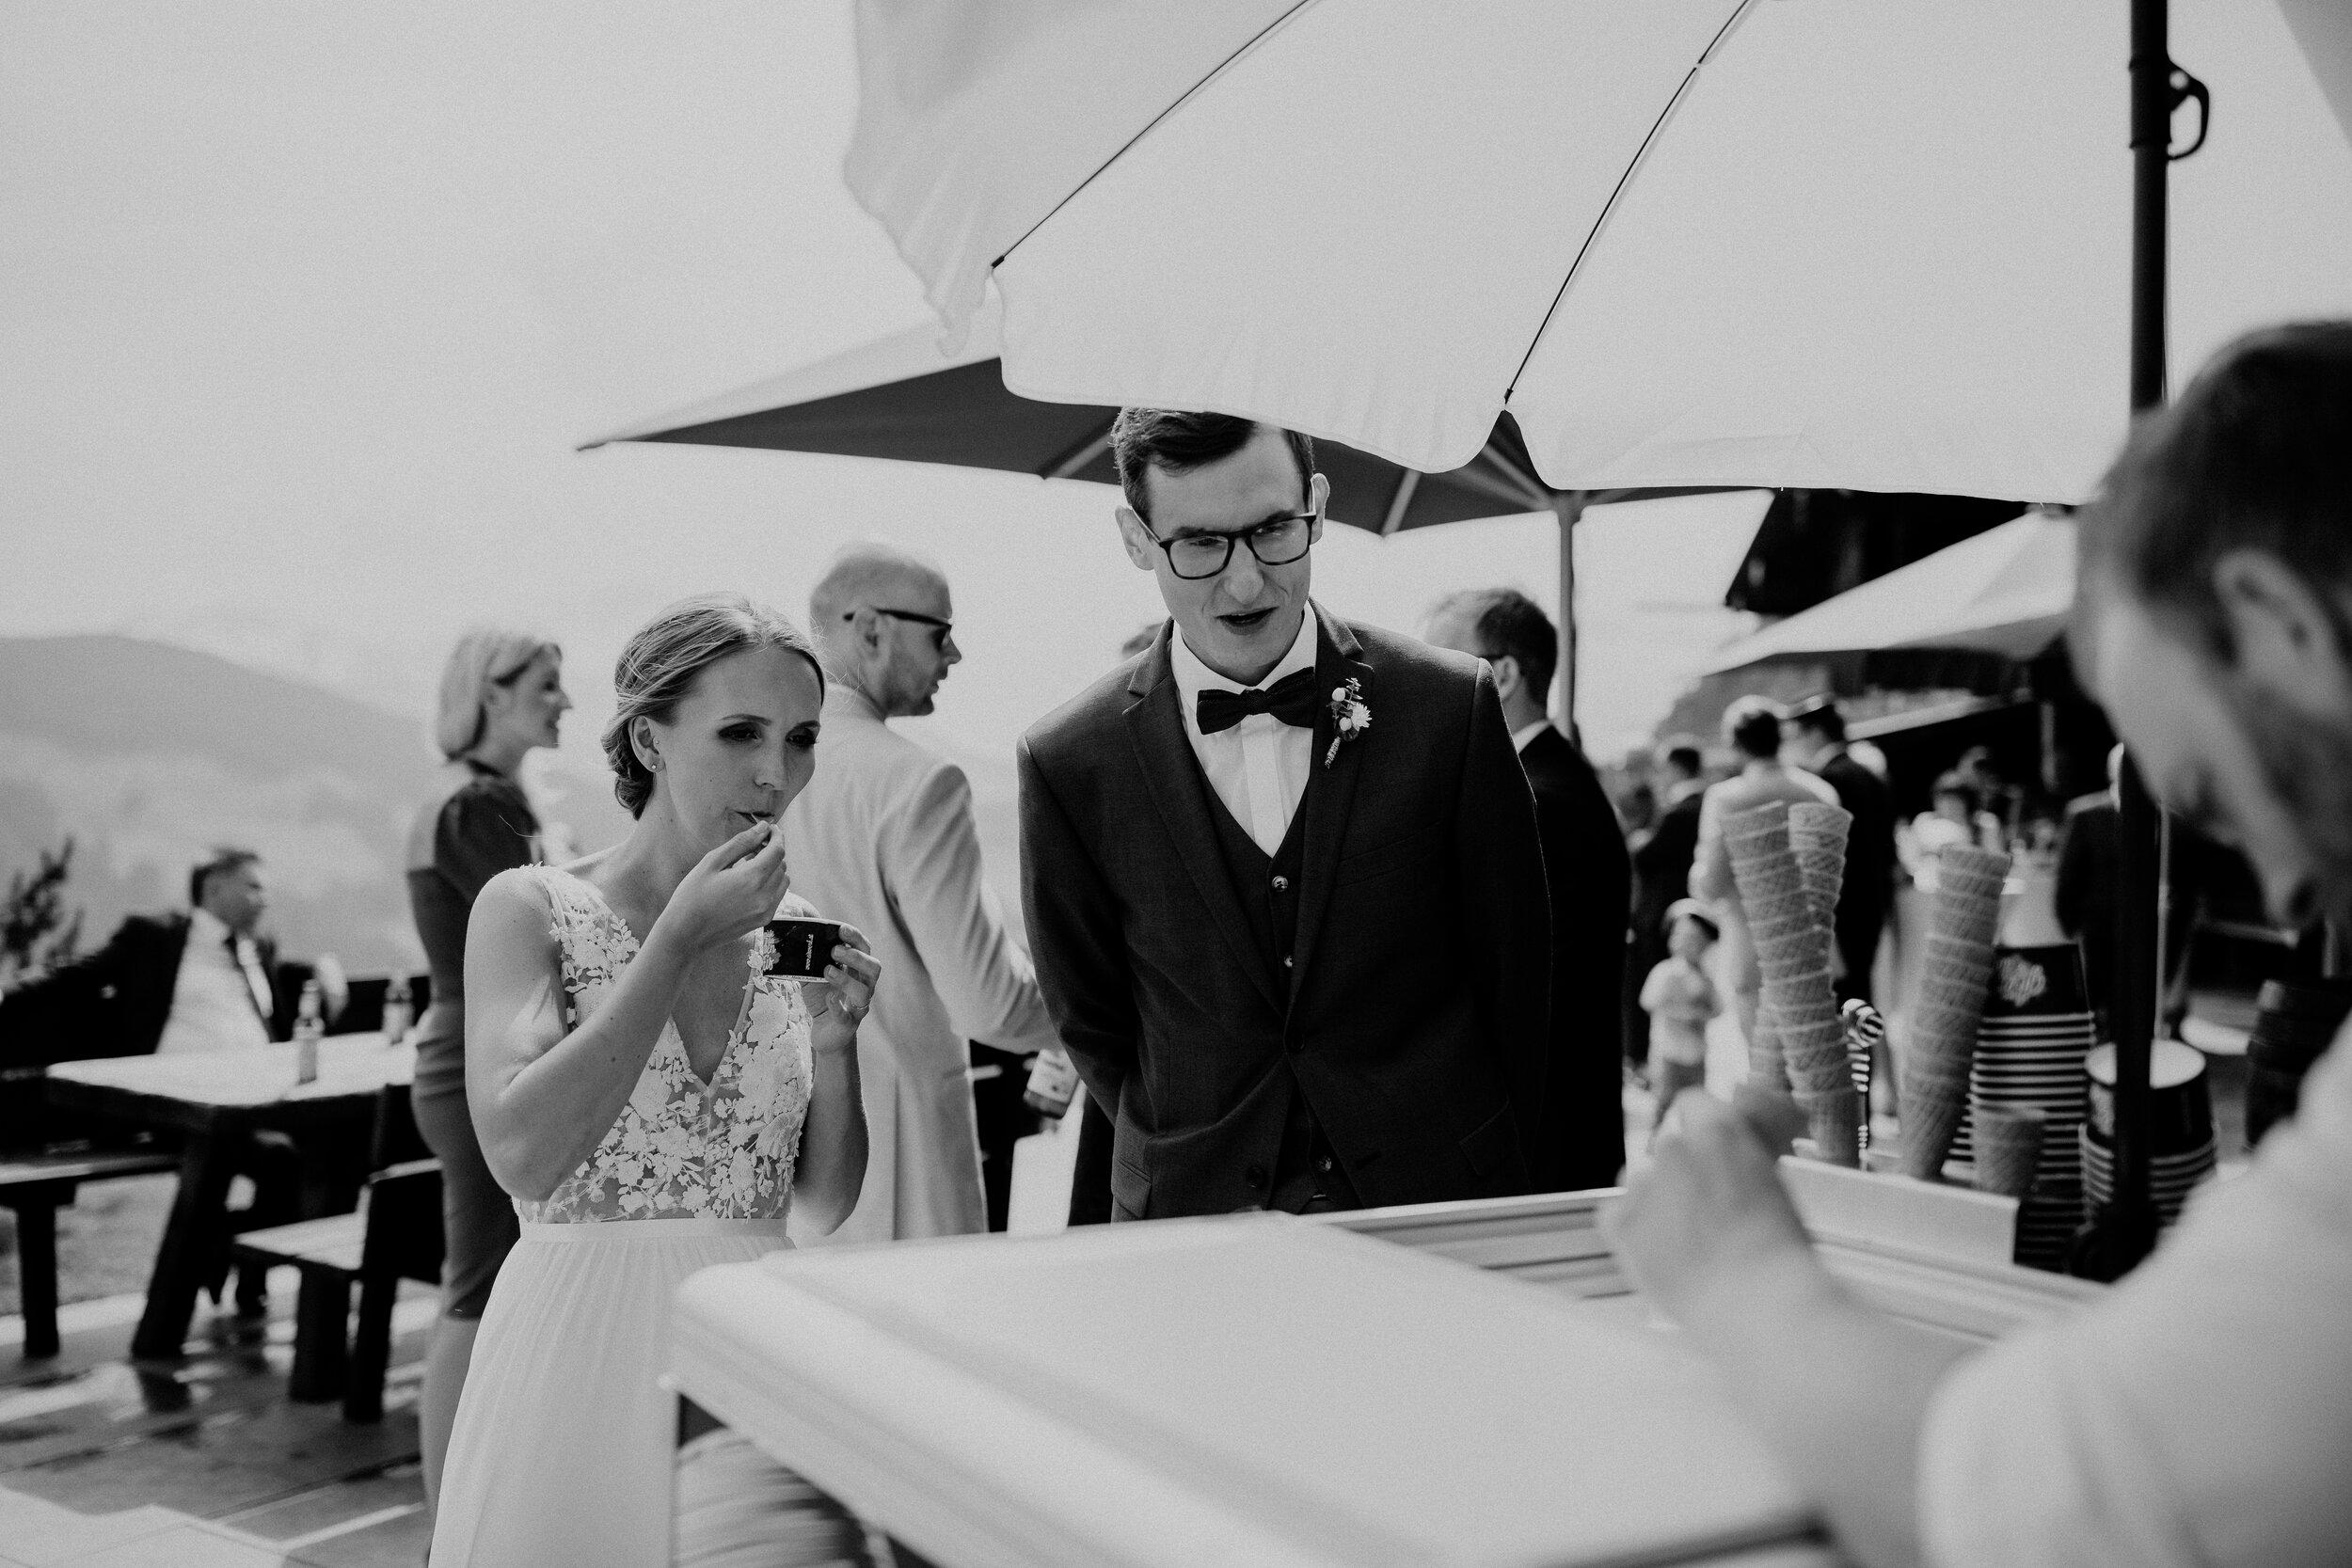 rosemarrylemon_ab_Hochzeitsplanung51.jpg